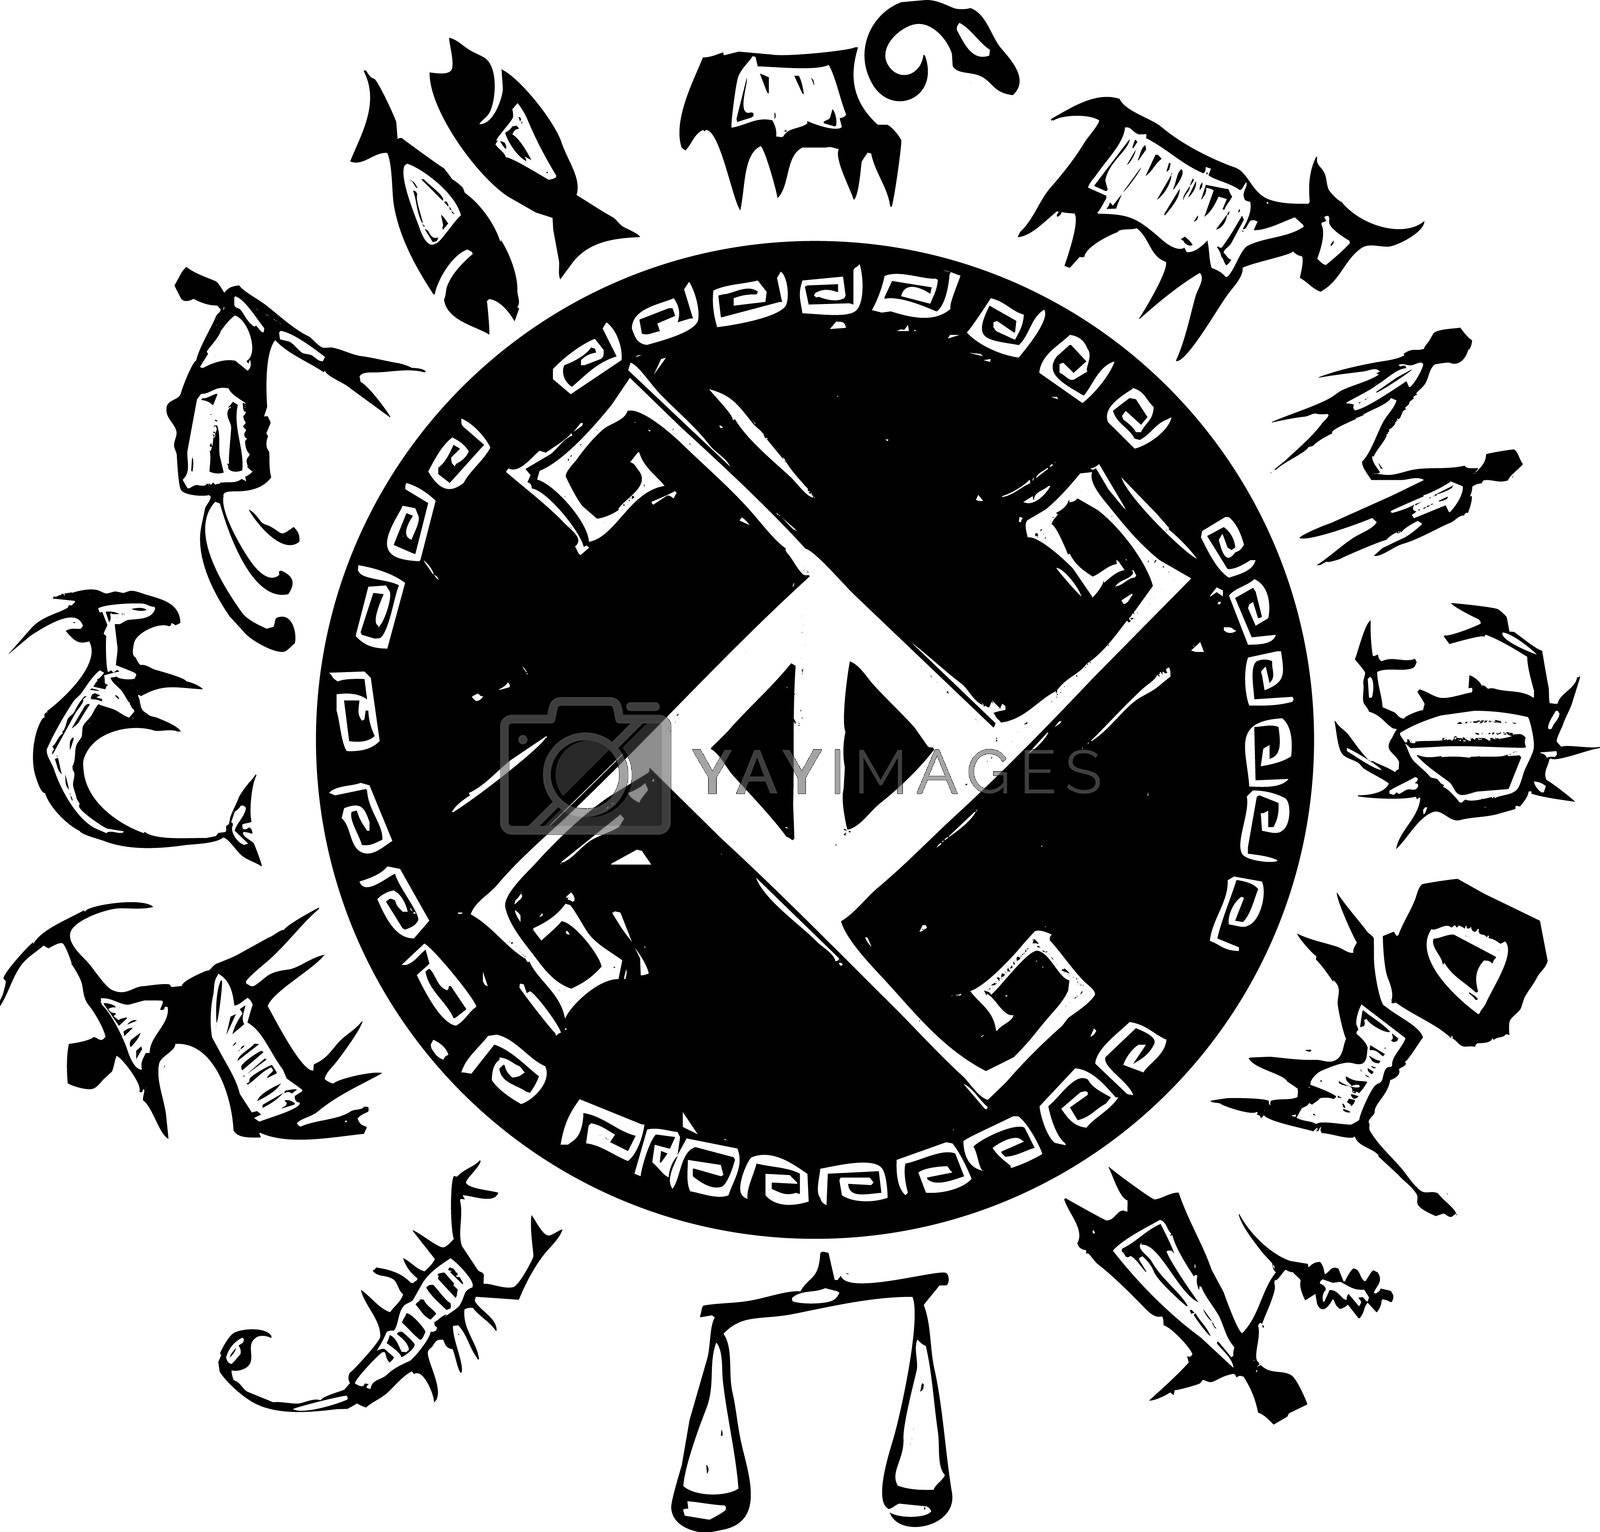 Primitive western zodiac around a center cross design.